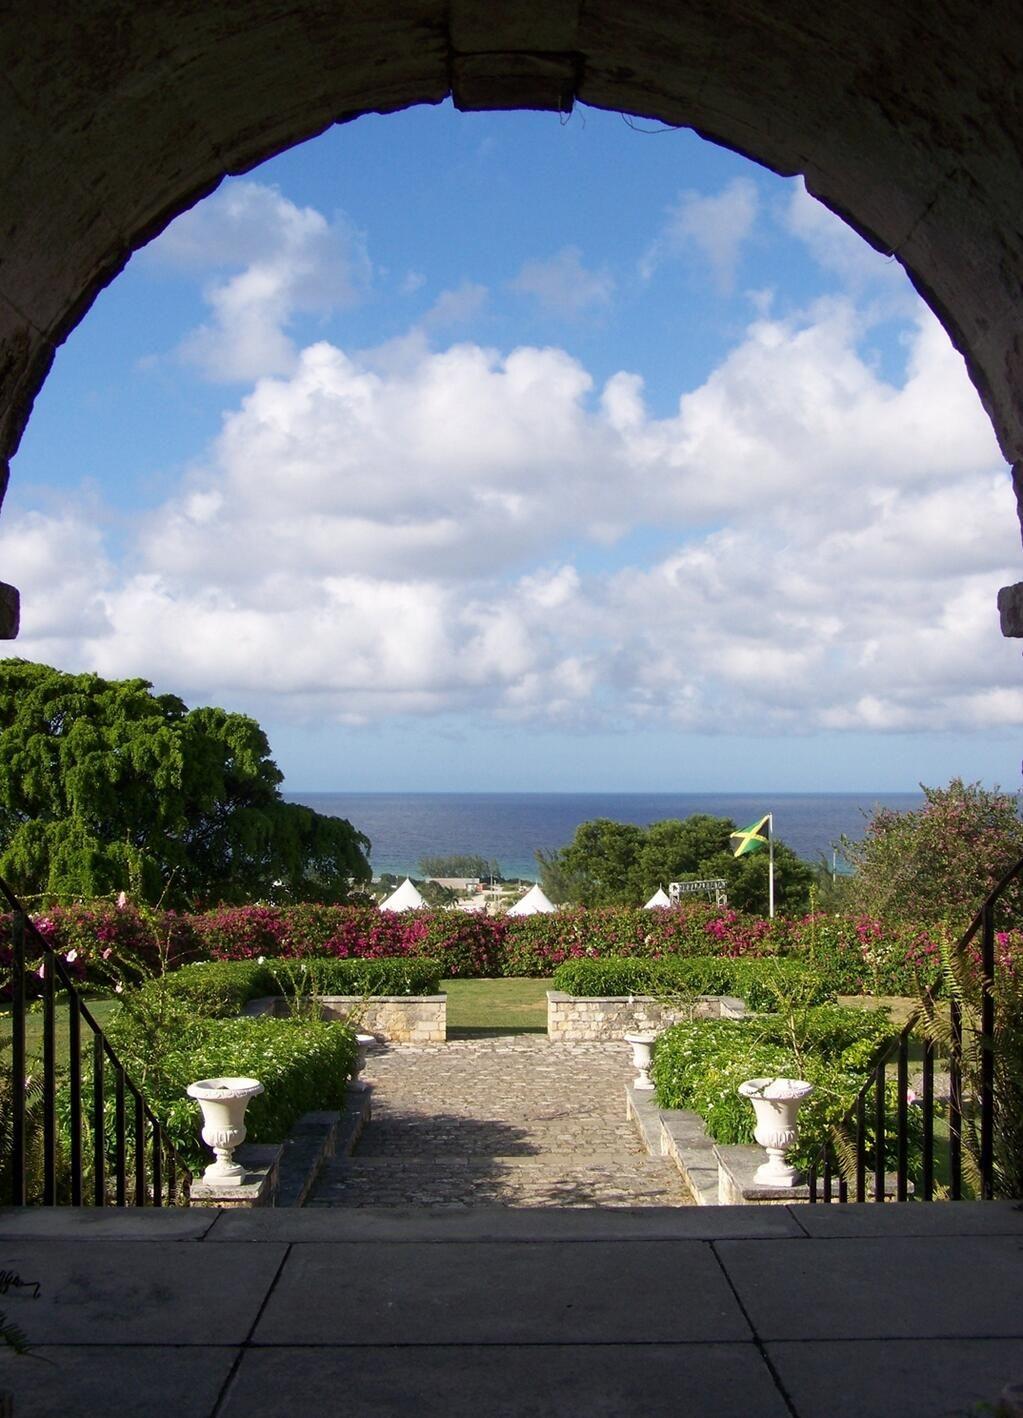 rachel webb on Jamaica vacation, Jamaica travel